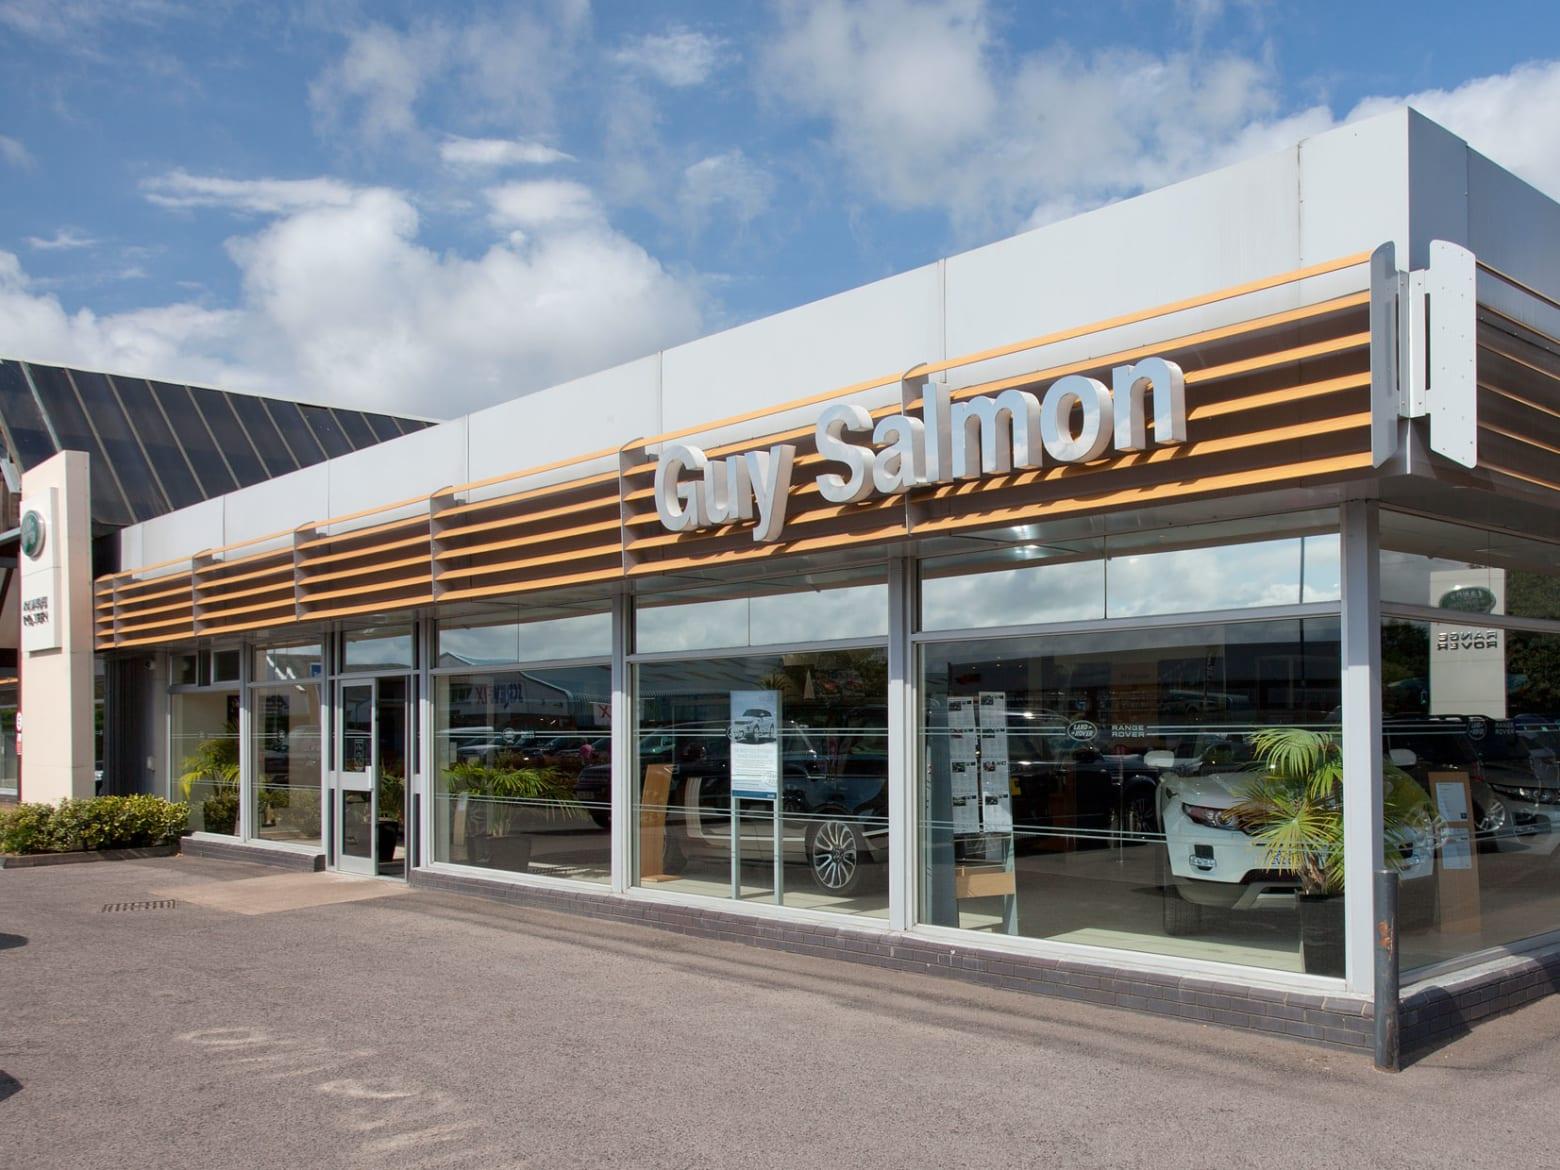 Guy Salmon Land Rover Stratford Upon Avon Sytner Group Limited